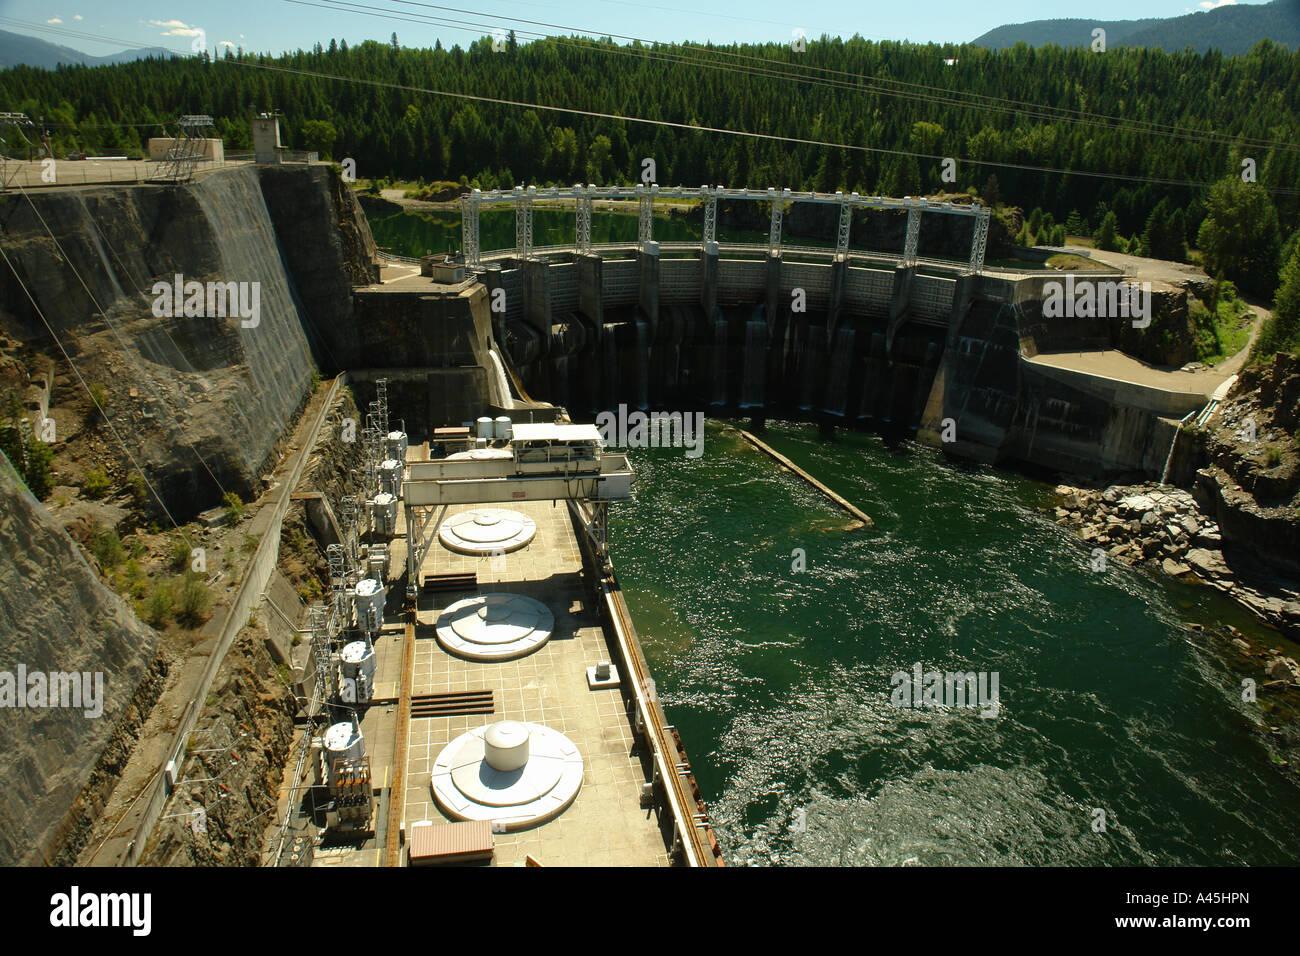 Captivating AJD56365, Clark Fork, ID, Idaho, Cabinet Gorge Dam, Hydroelectric  Development, Clark Fork River